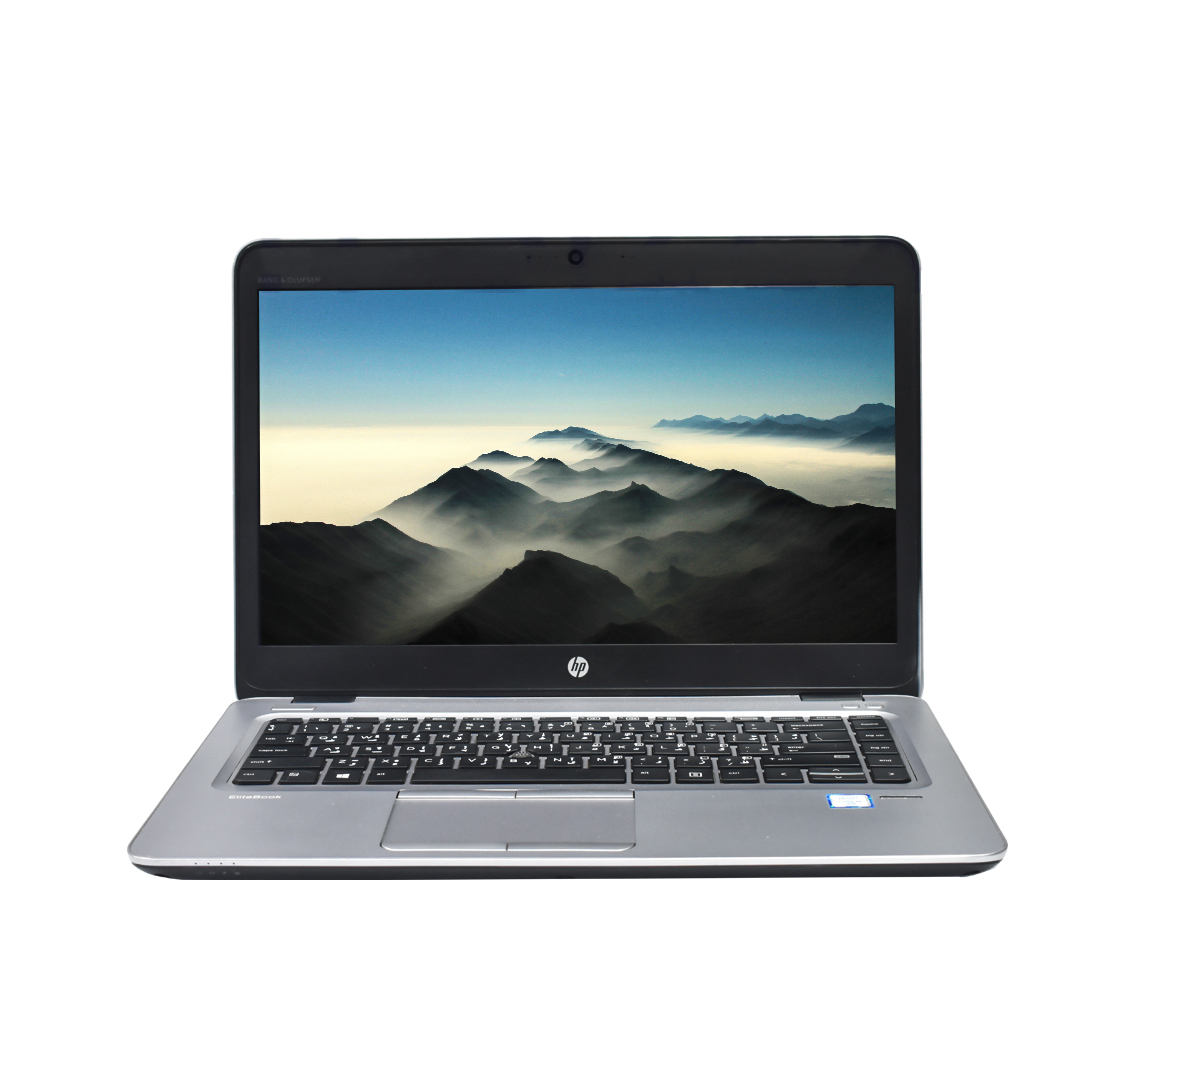 HP EliteBook 840 G3 Business Laptop, Intel Core i5-6300U CPU, 8GB DDR4 SODIMM RAM, 256GB SSD-M2, 14 inch Display, Windows 10 Pro (Refurbished)